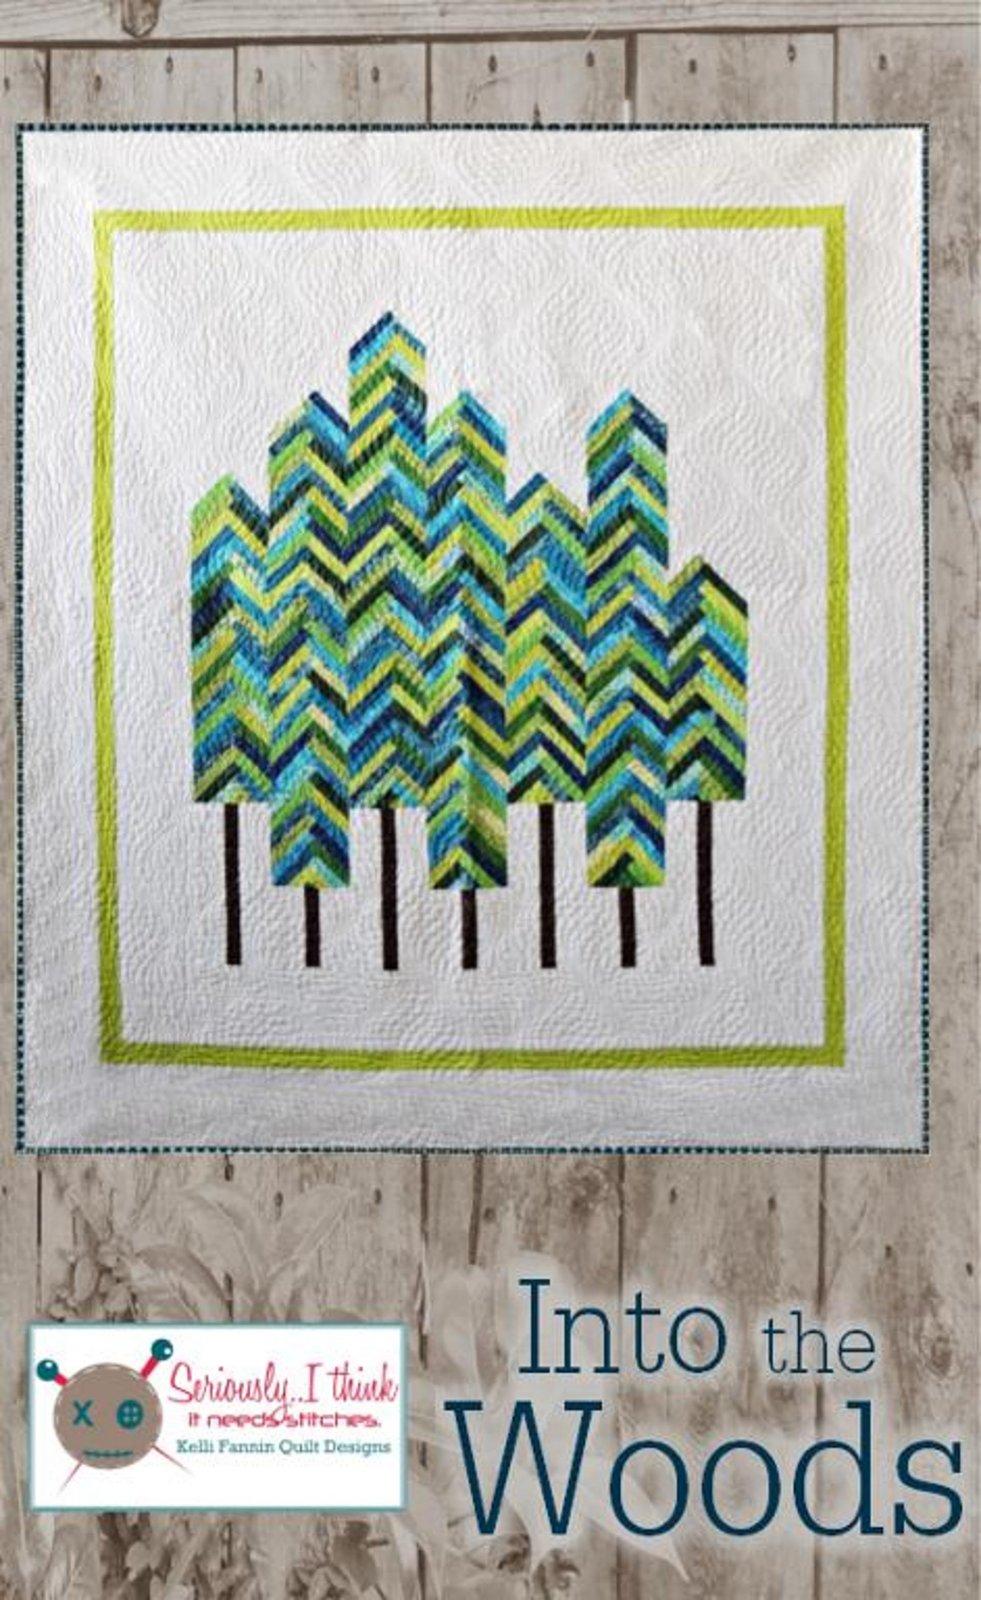 Kelli Fannin Quilt Designs - Into the Woods